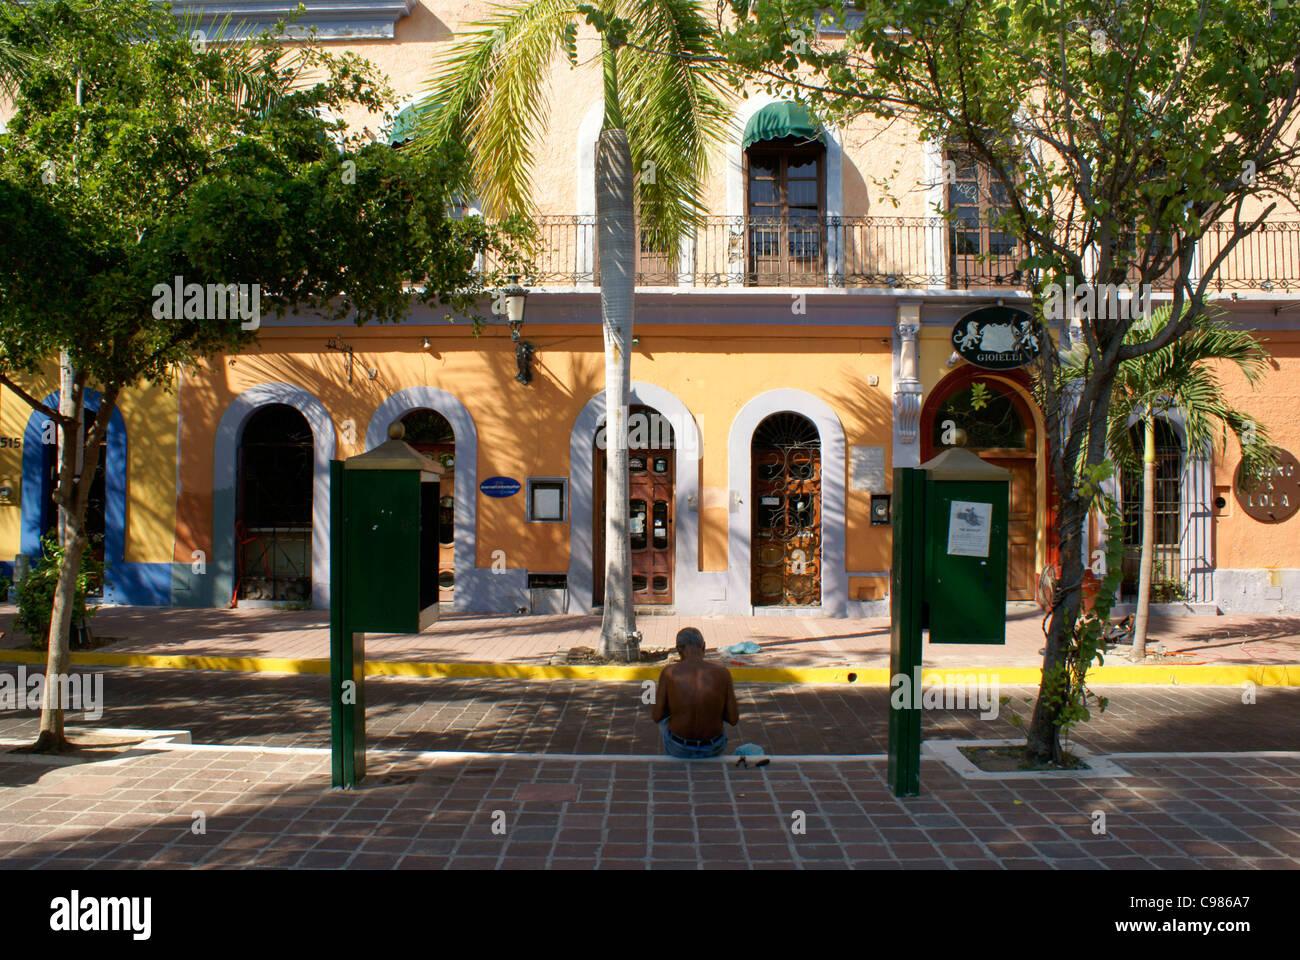 Restored nineteenth century buildings on the Plazuela Machado in Old Mazatlan, Sinaloa, Mexico - Stock Image